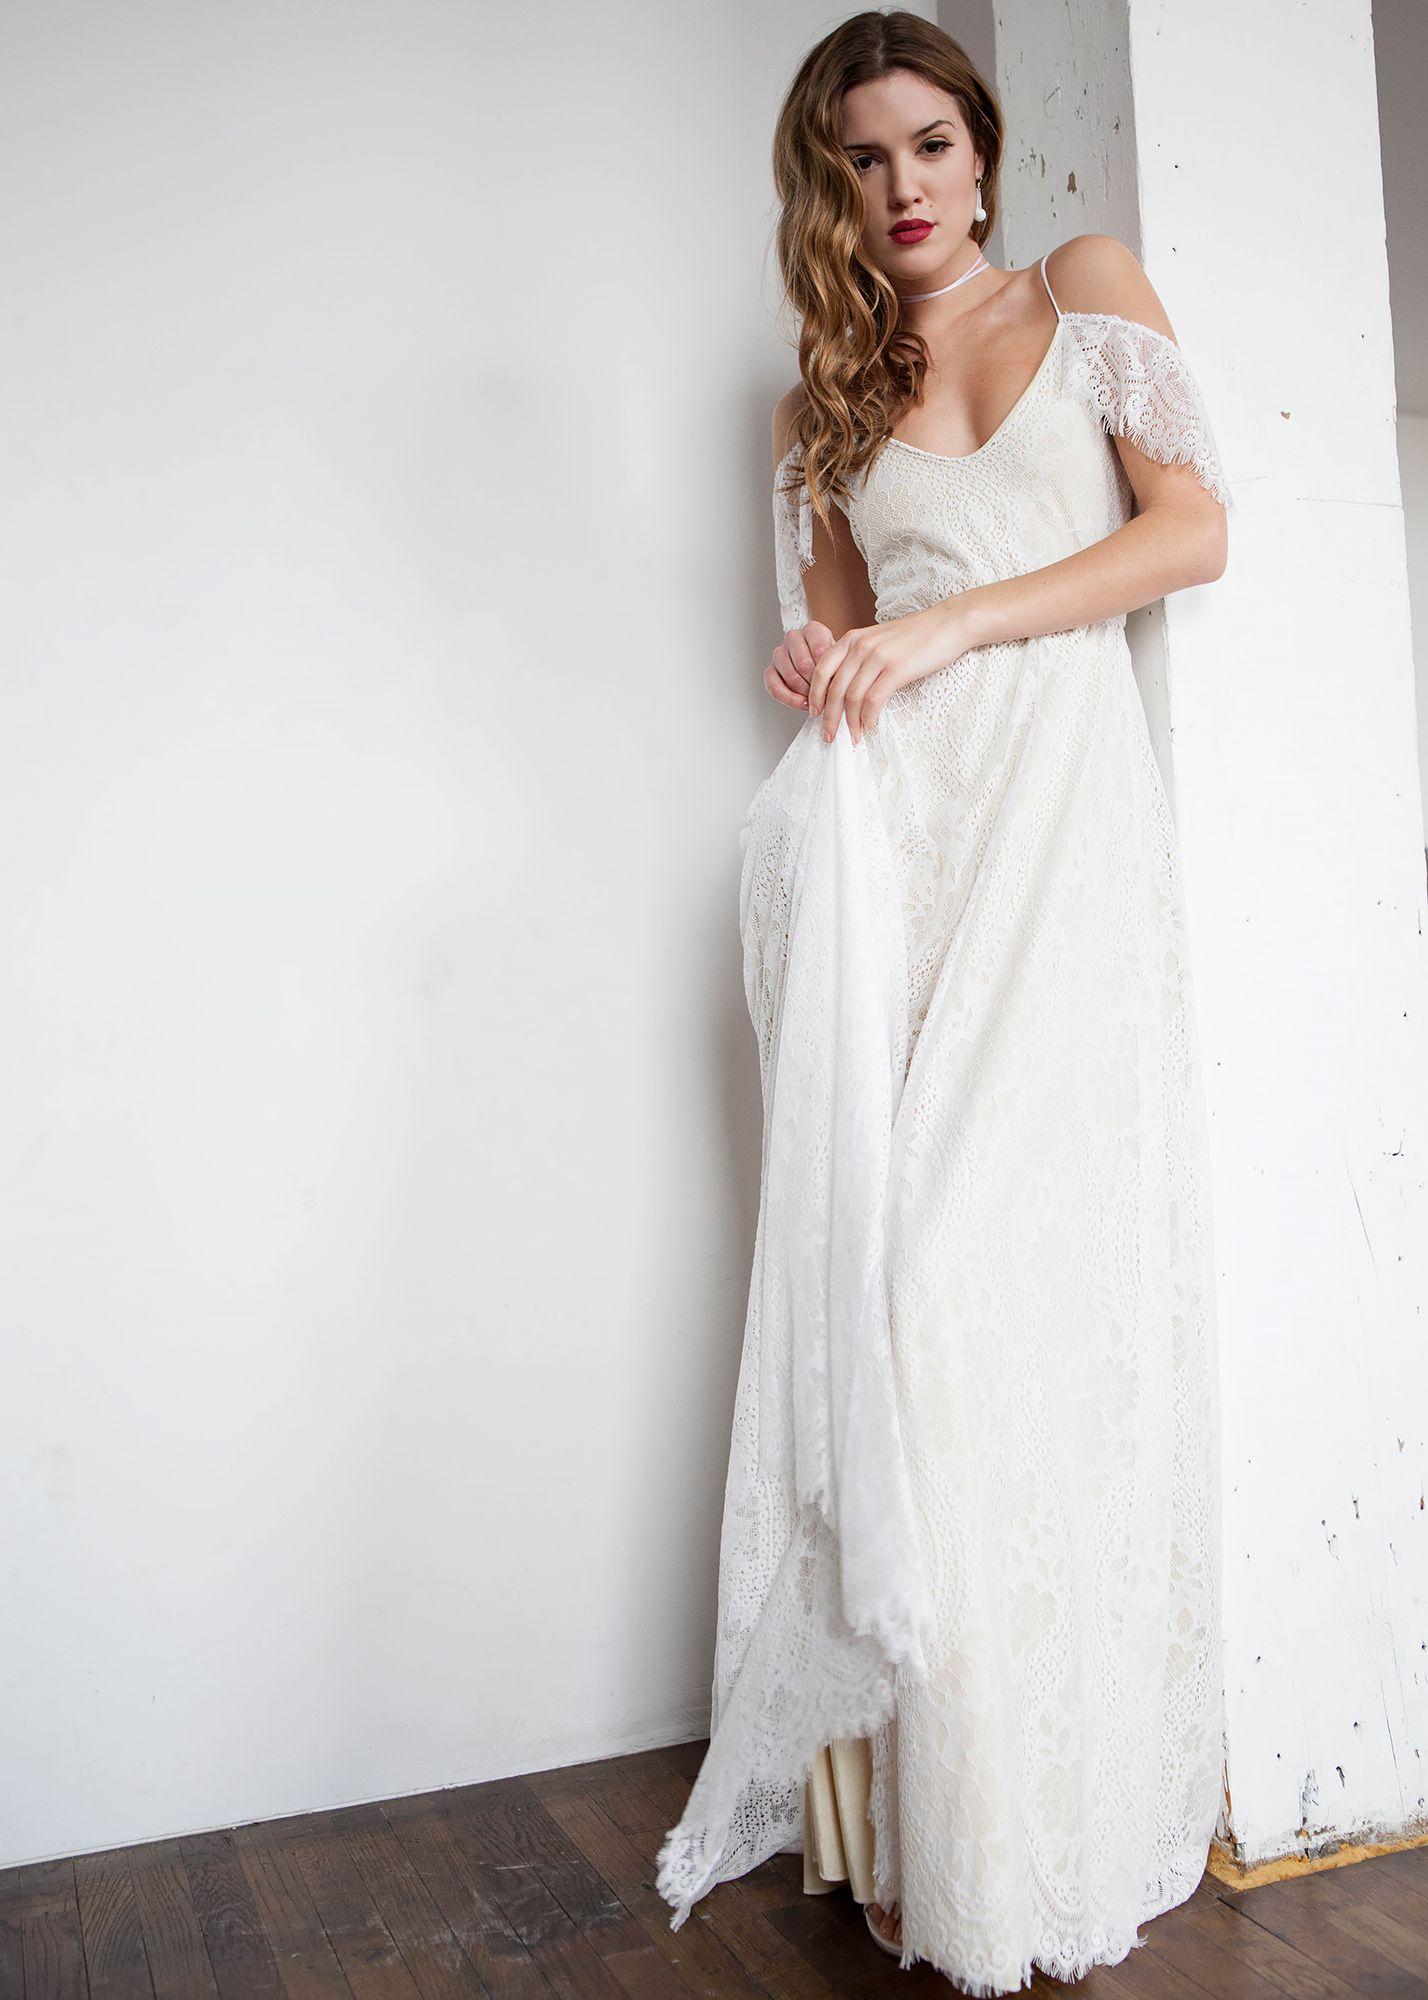 Romantic Wedding Dress, Paris Dress by Wear Your Love   Heaven and ...